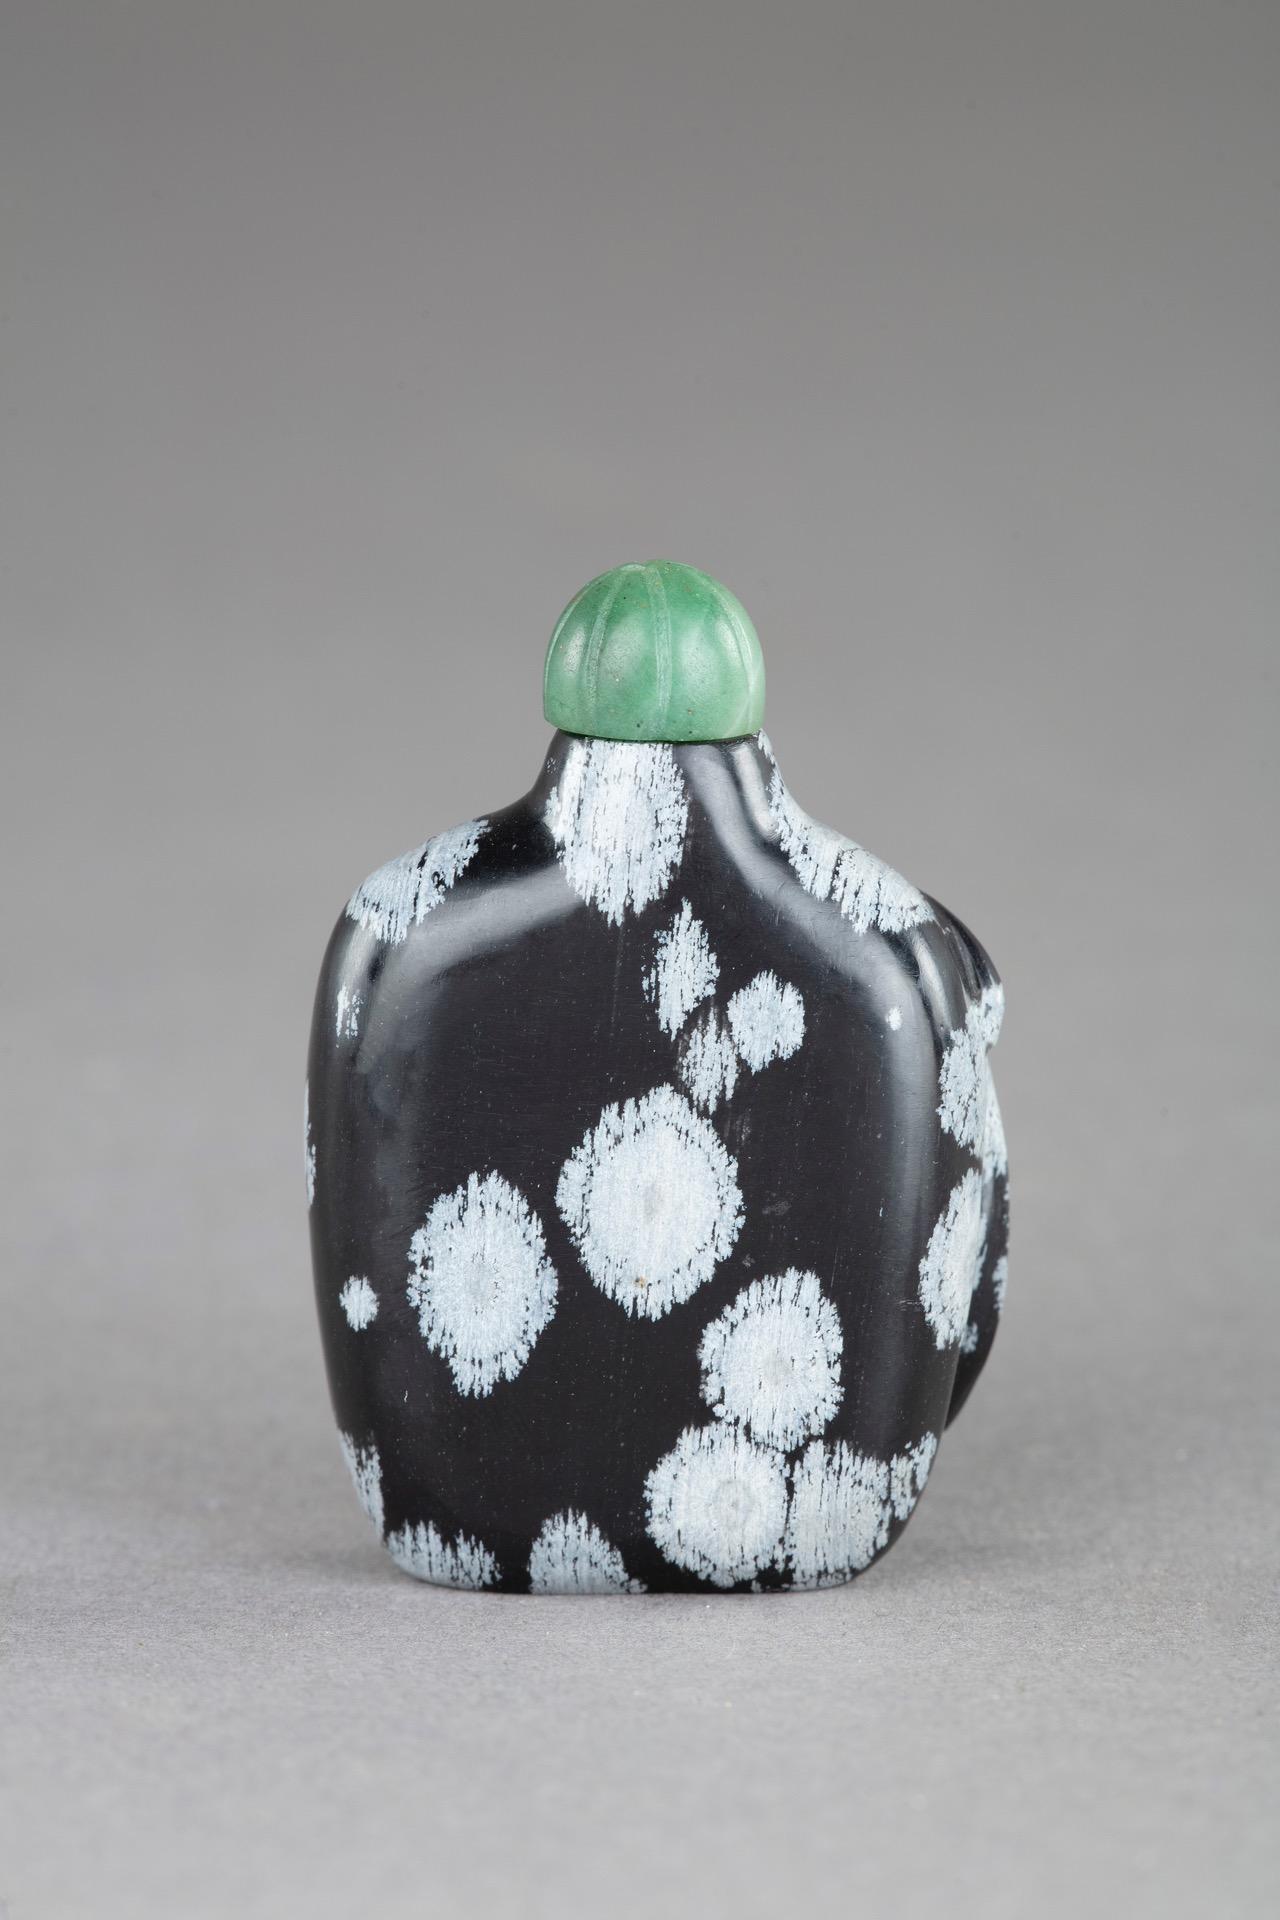 thumb2|Snuff bottle in vetro